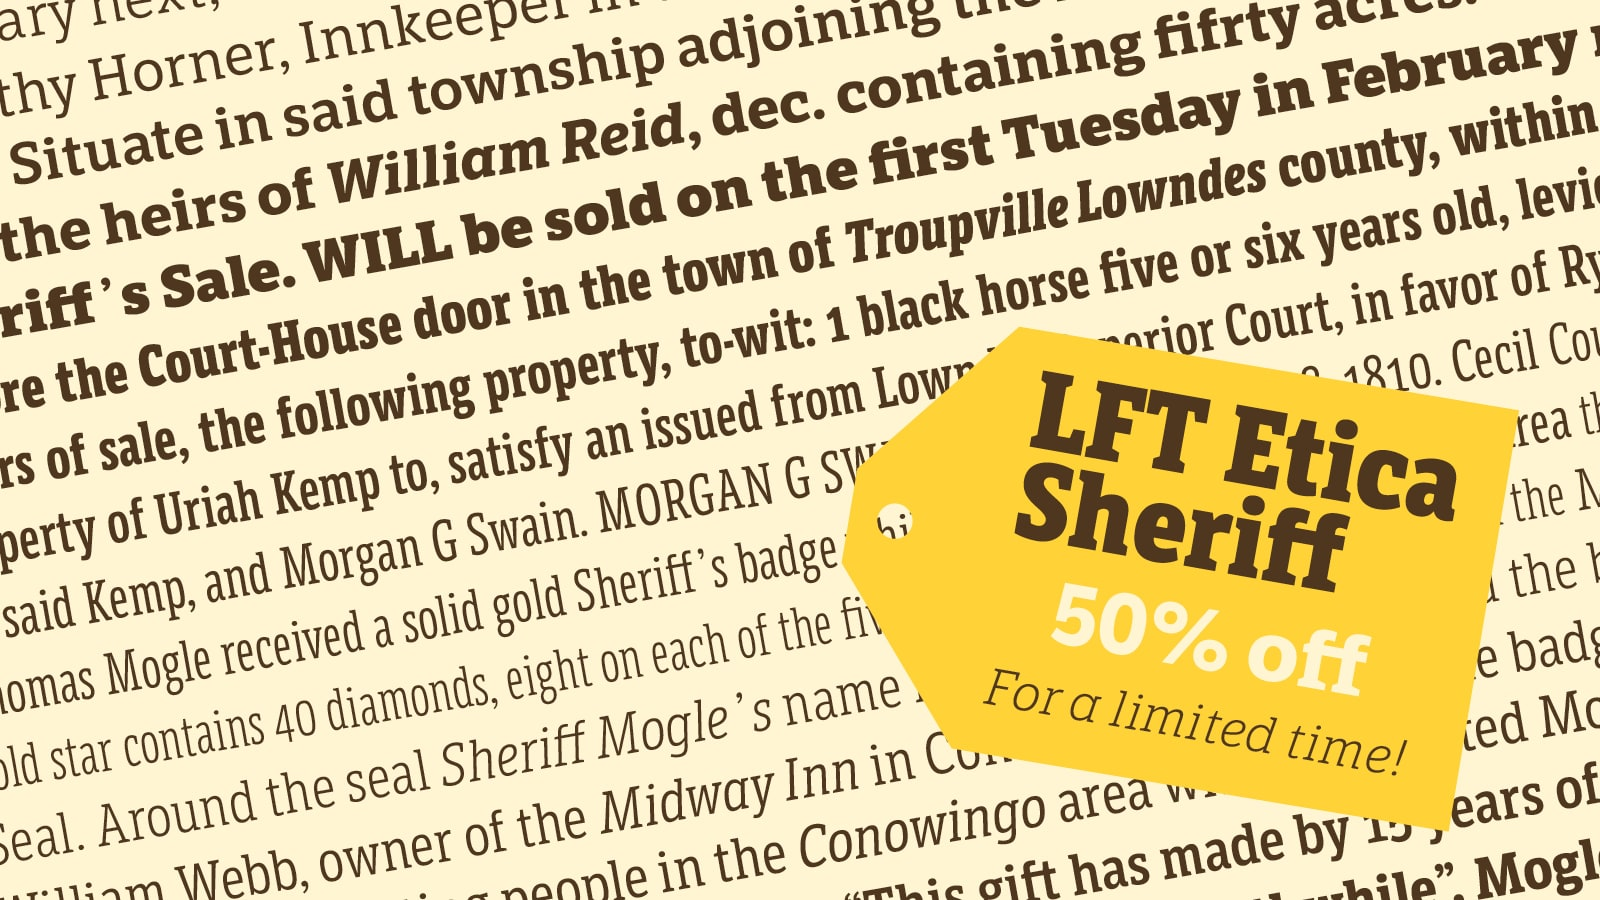 LFT Etica Sheriff 50% off